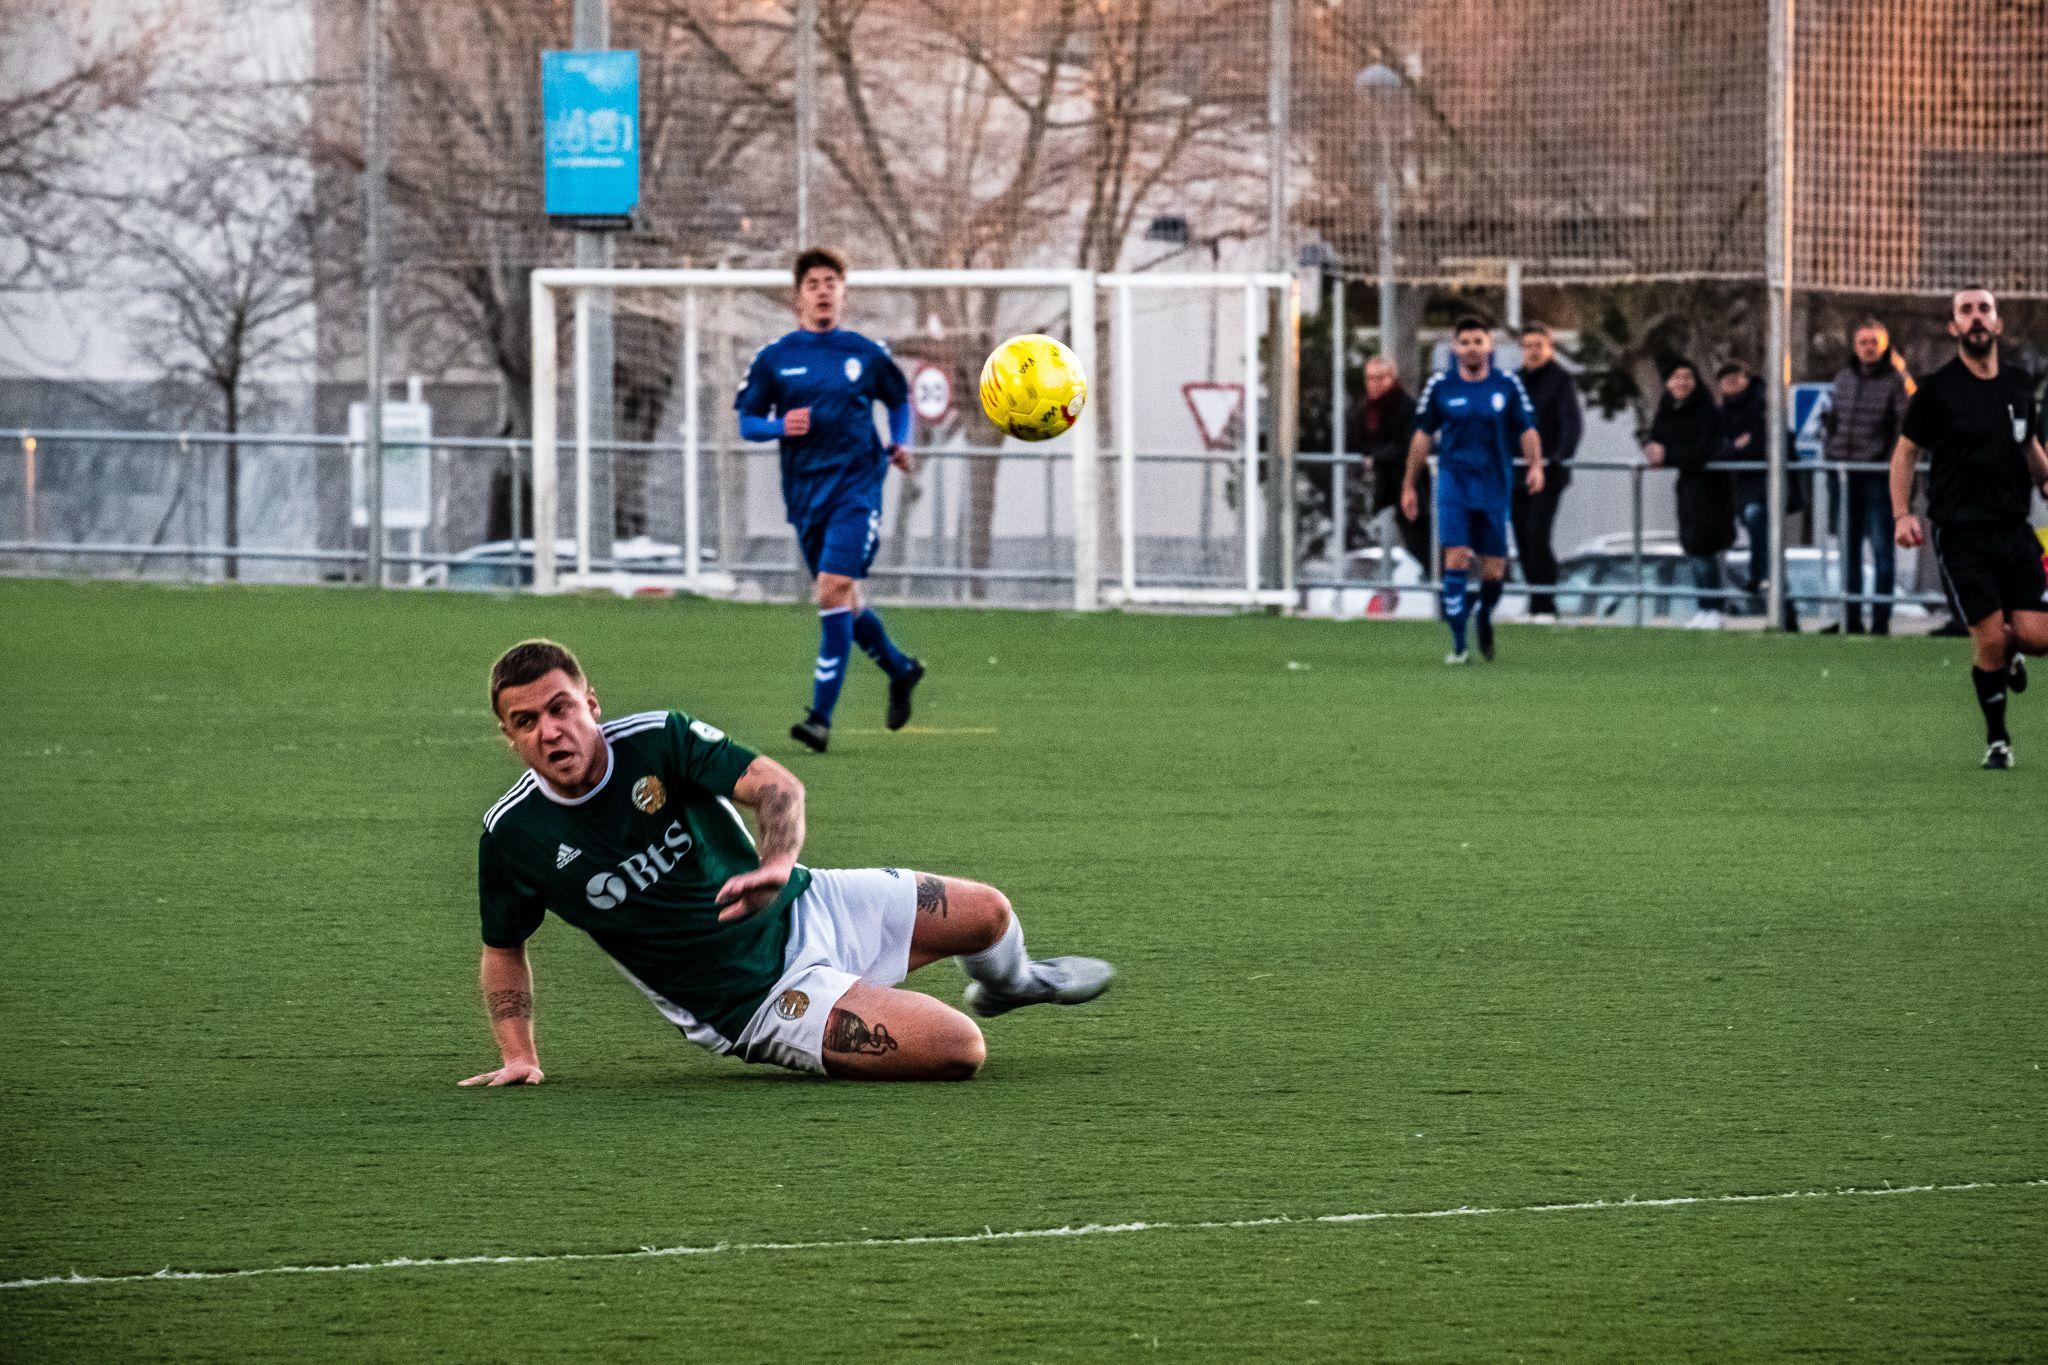 Partit de lliga fútbol masculí: Valldoreix FC-UE Sant Joan Despí. FOTO: Ale Gómez